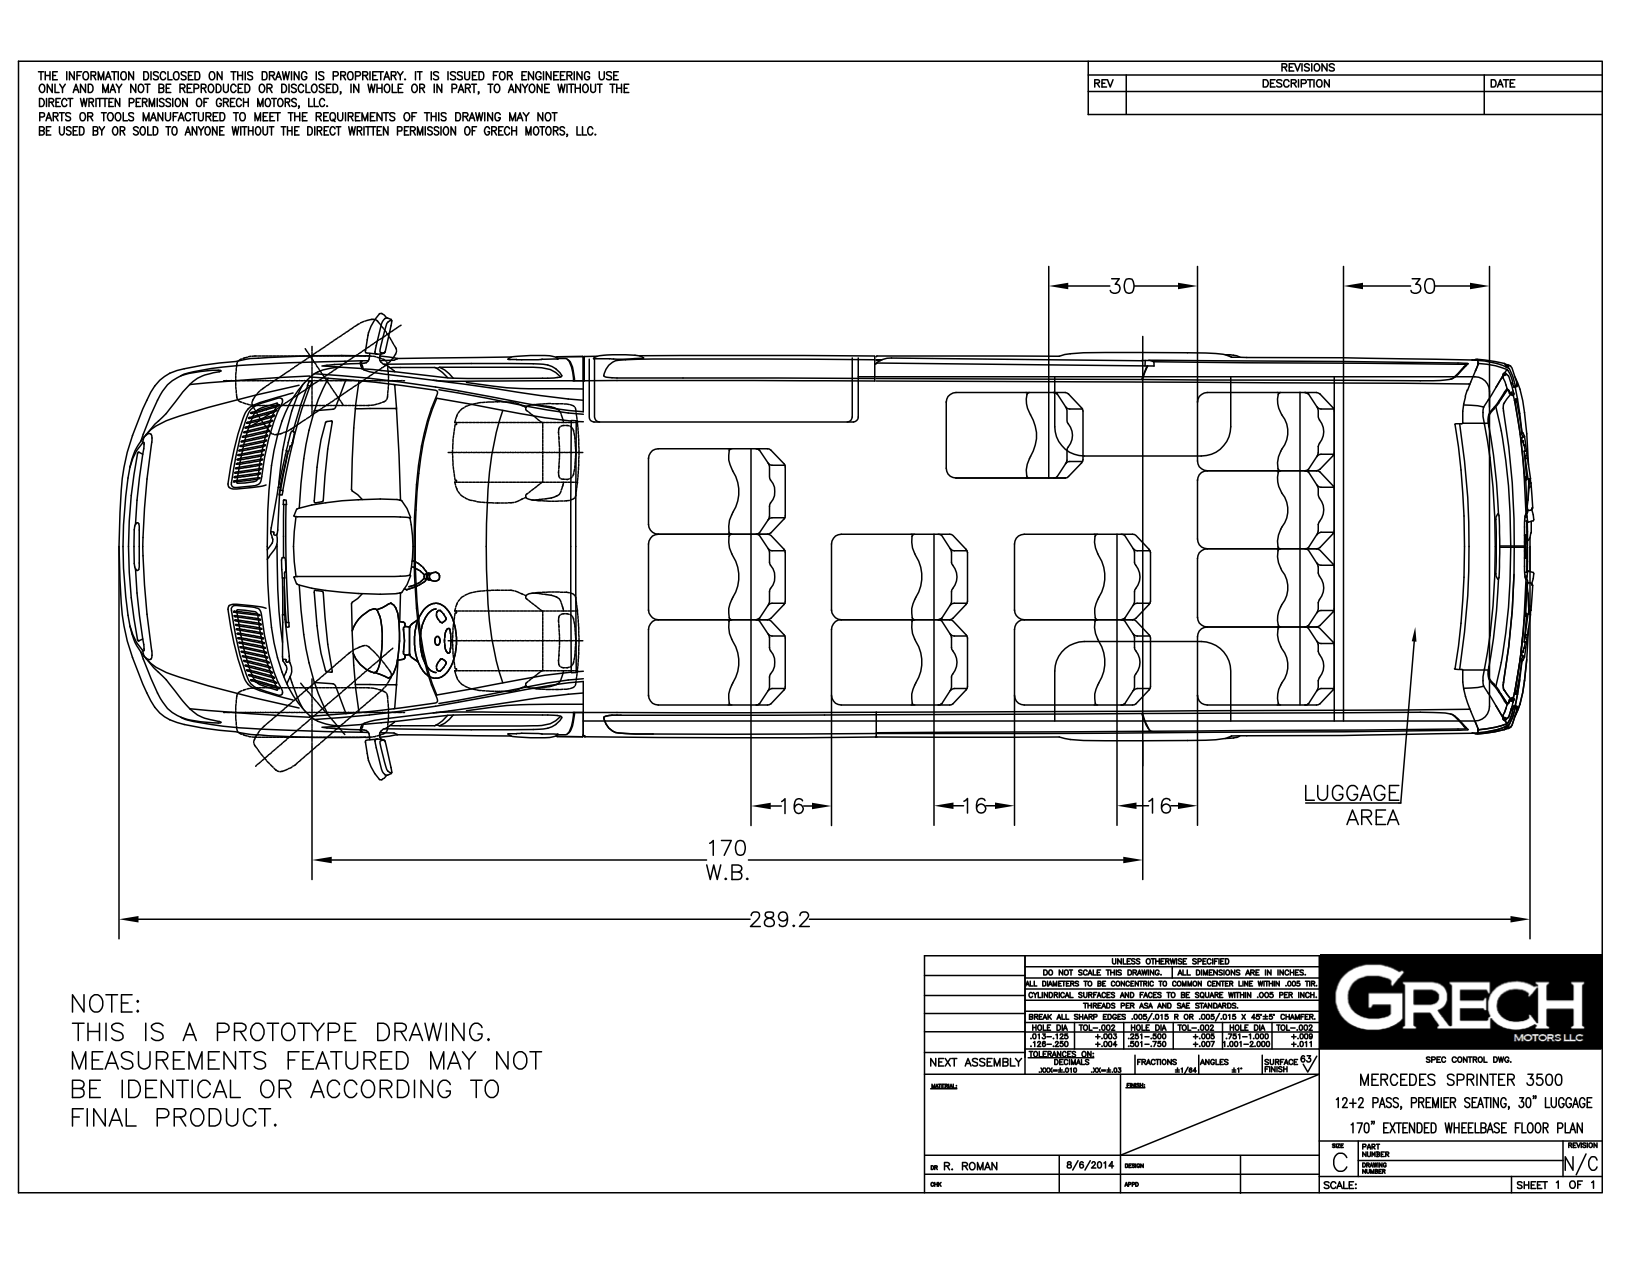 Grech Motors Sprinter Shuttle Floor plan